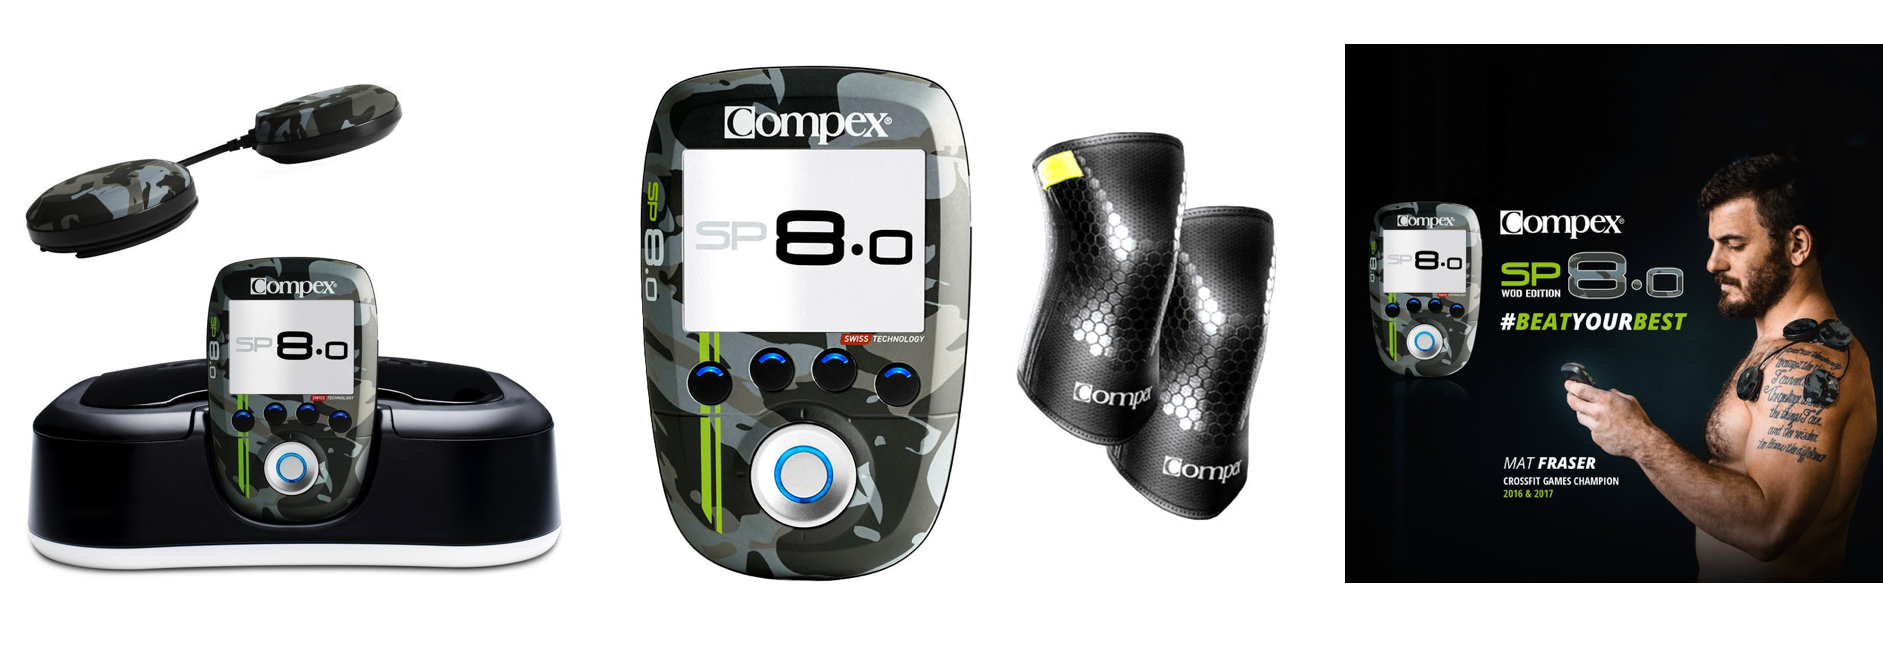 compex 8.0 wod montaje ch